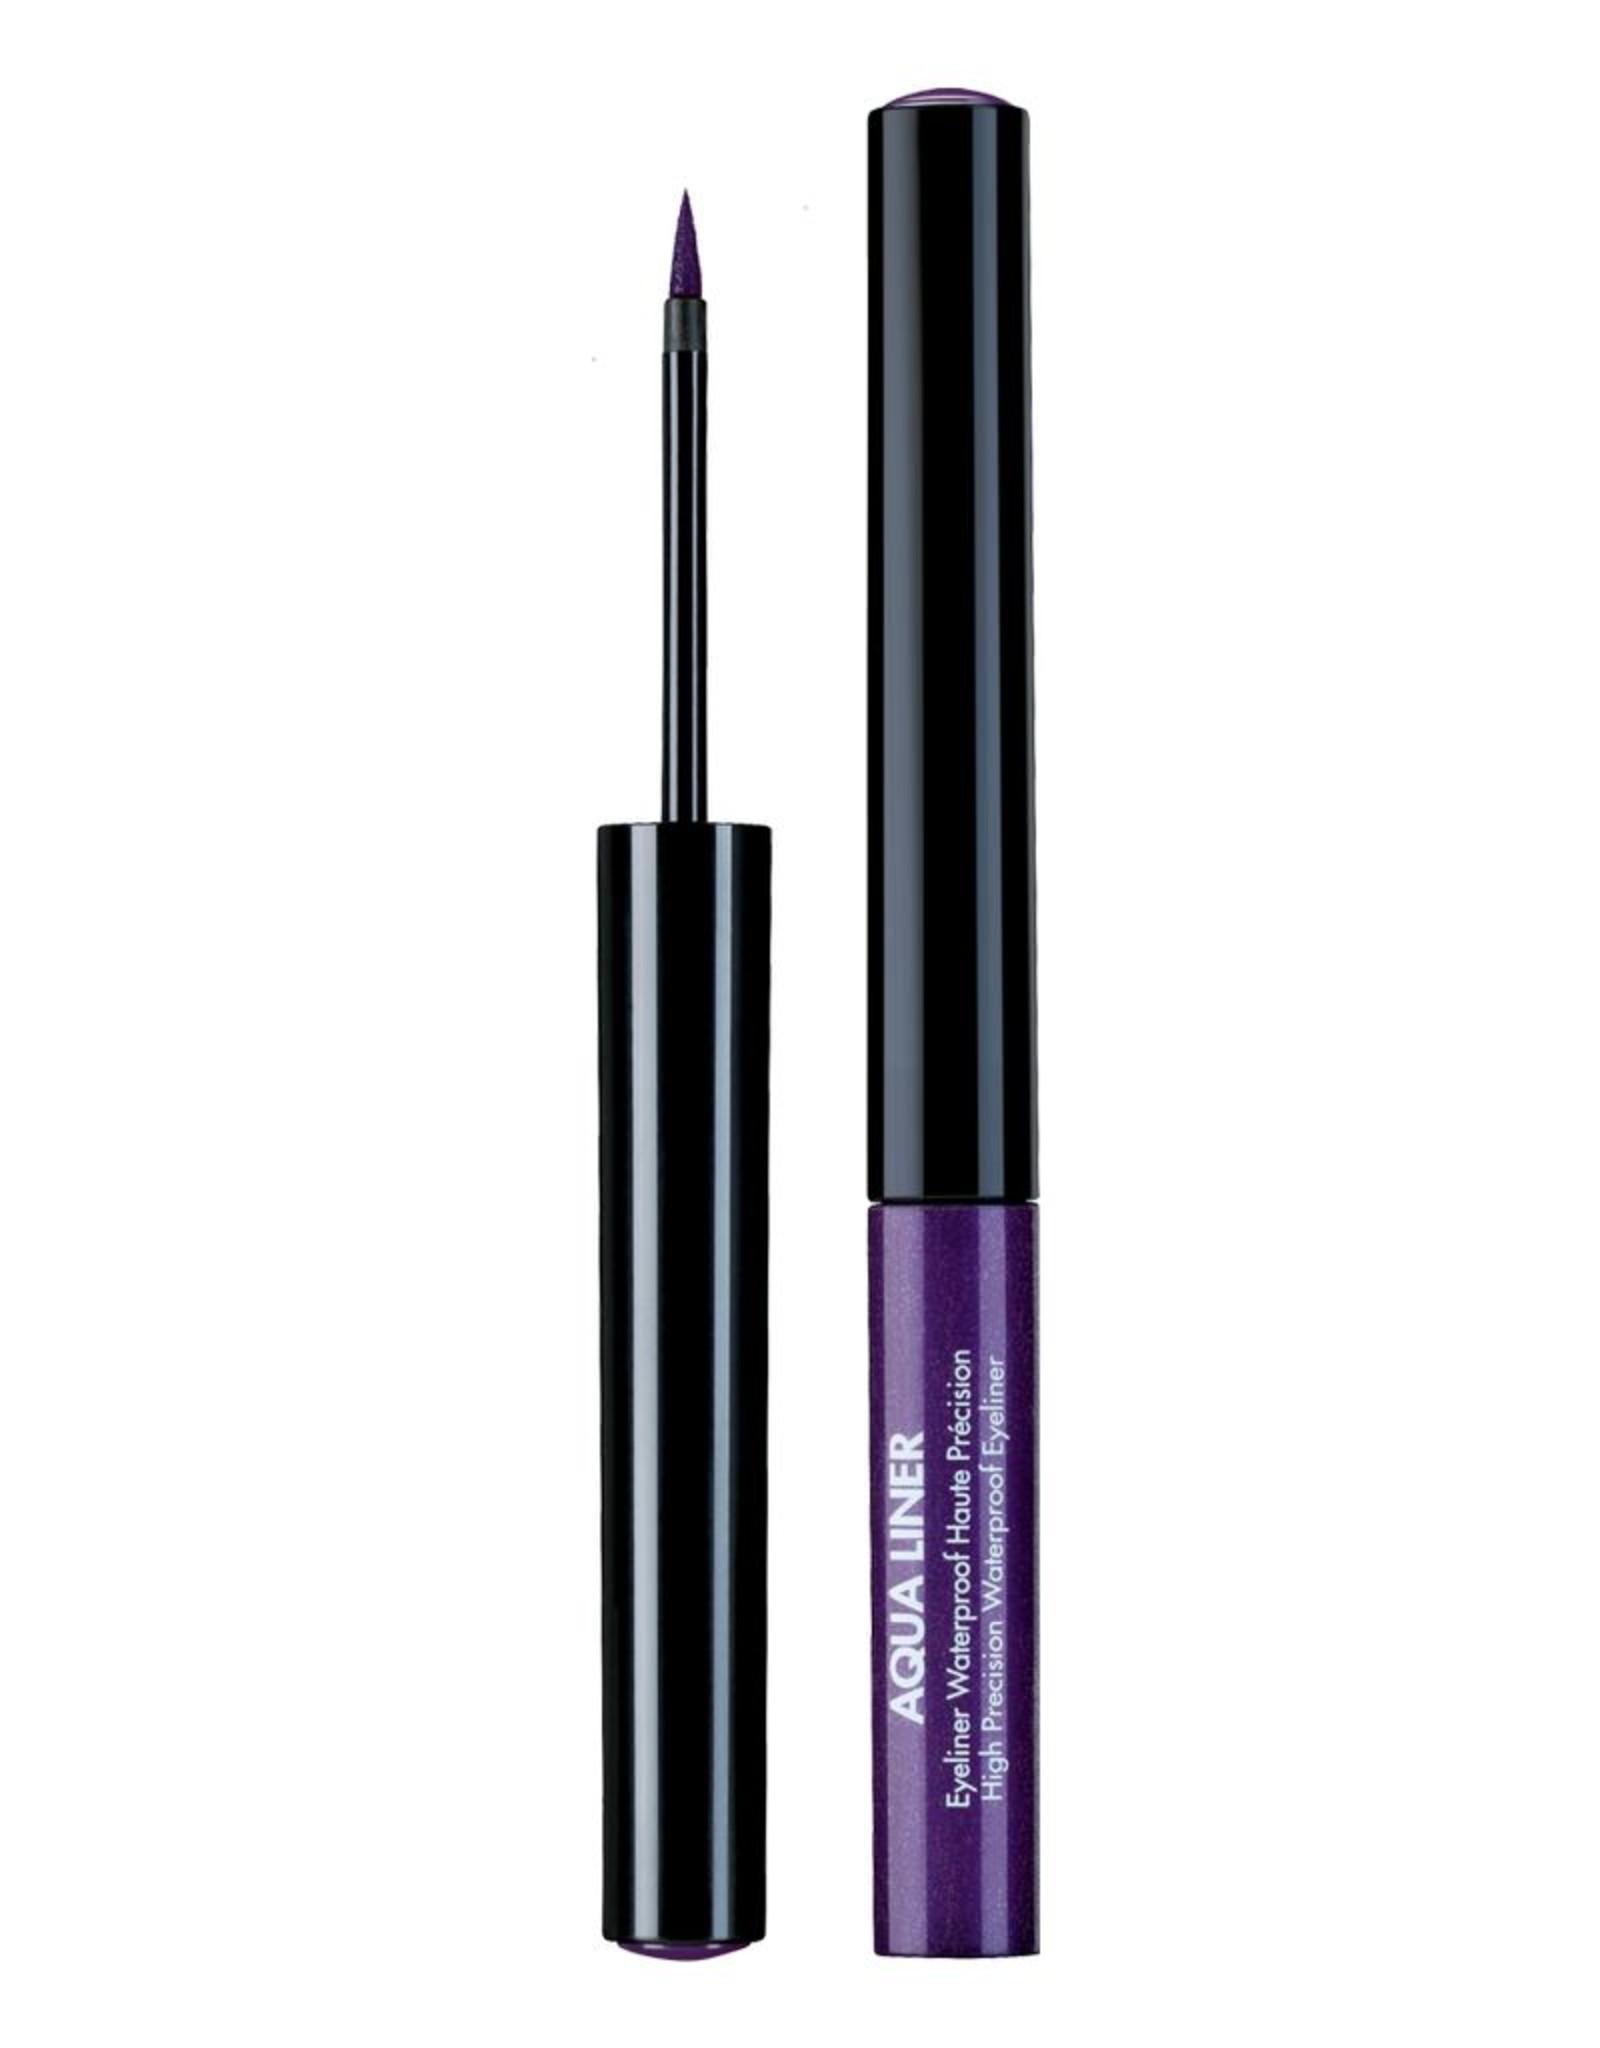 MUFE AQUALINER  1,7ml WPFN8 Violet Electrique Irise / Iridescent Electric Purple